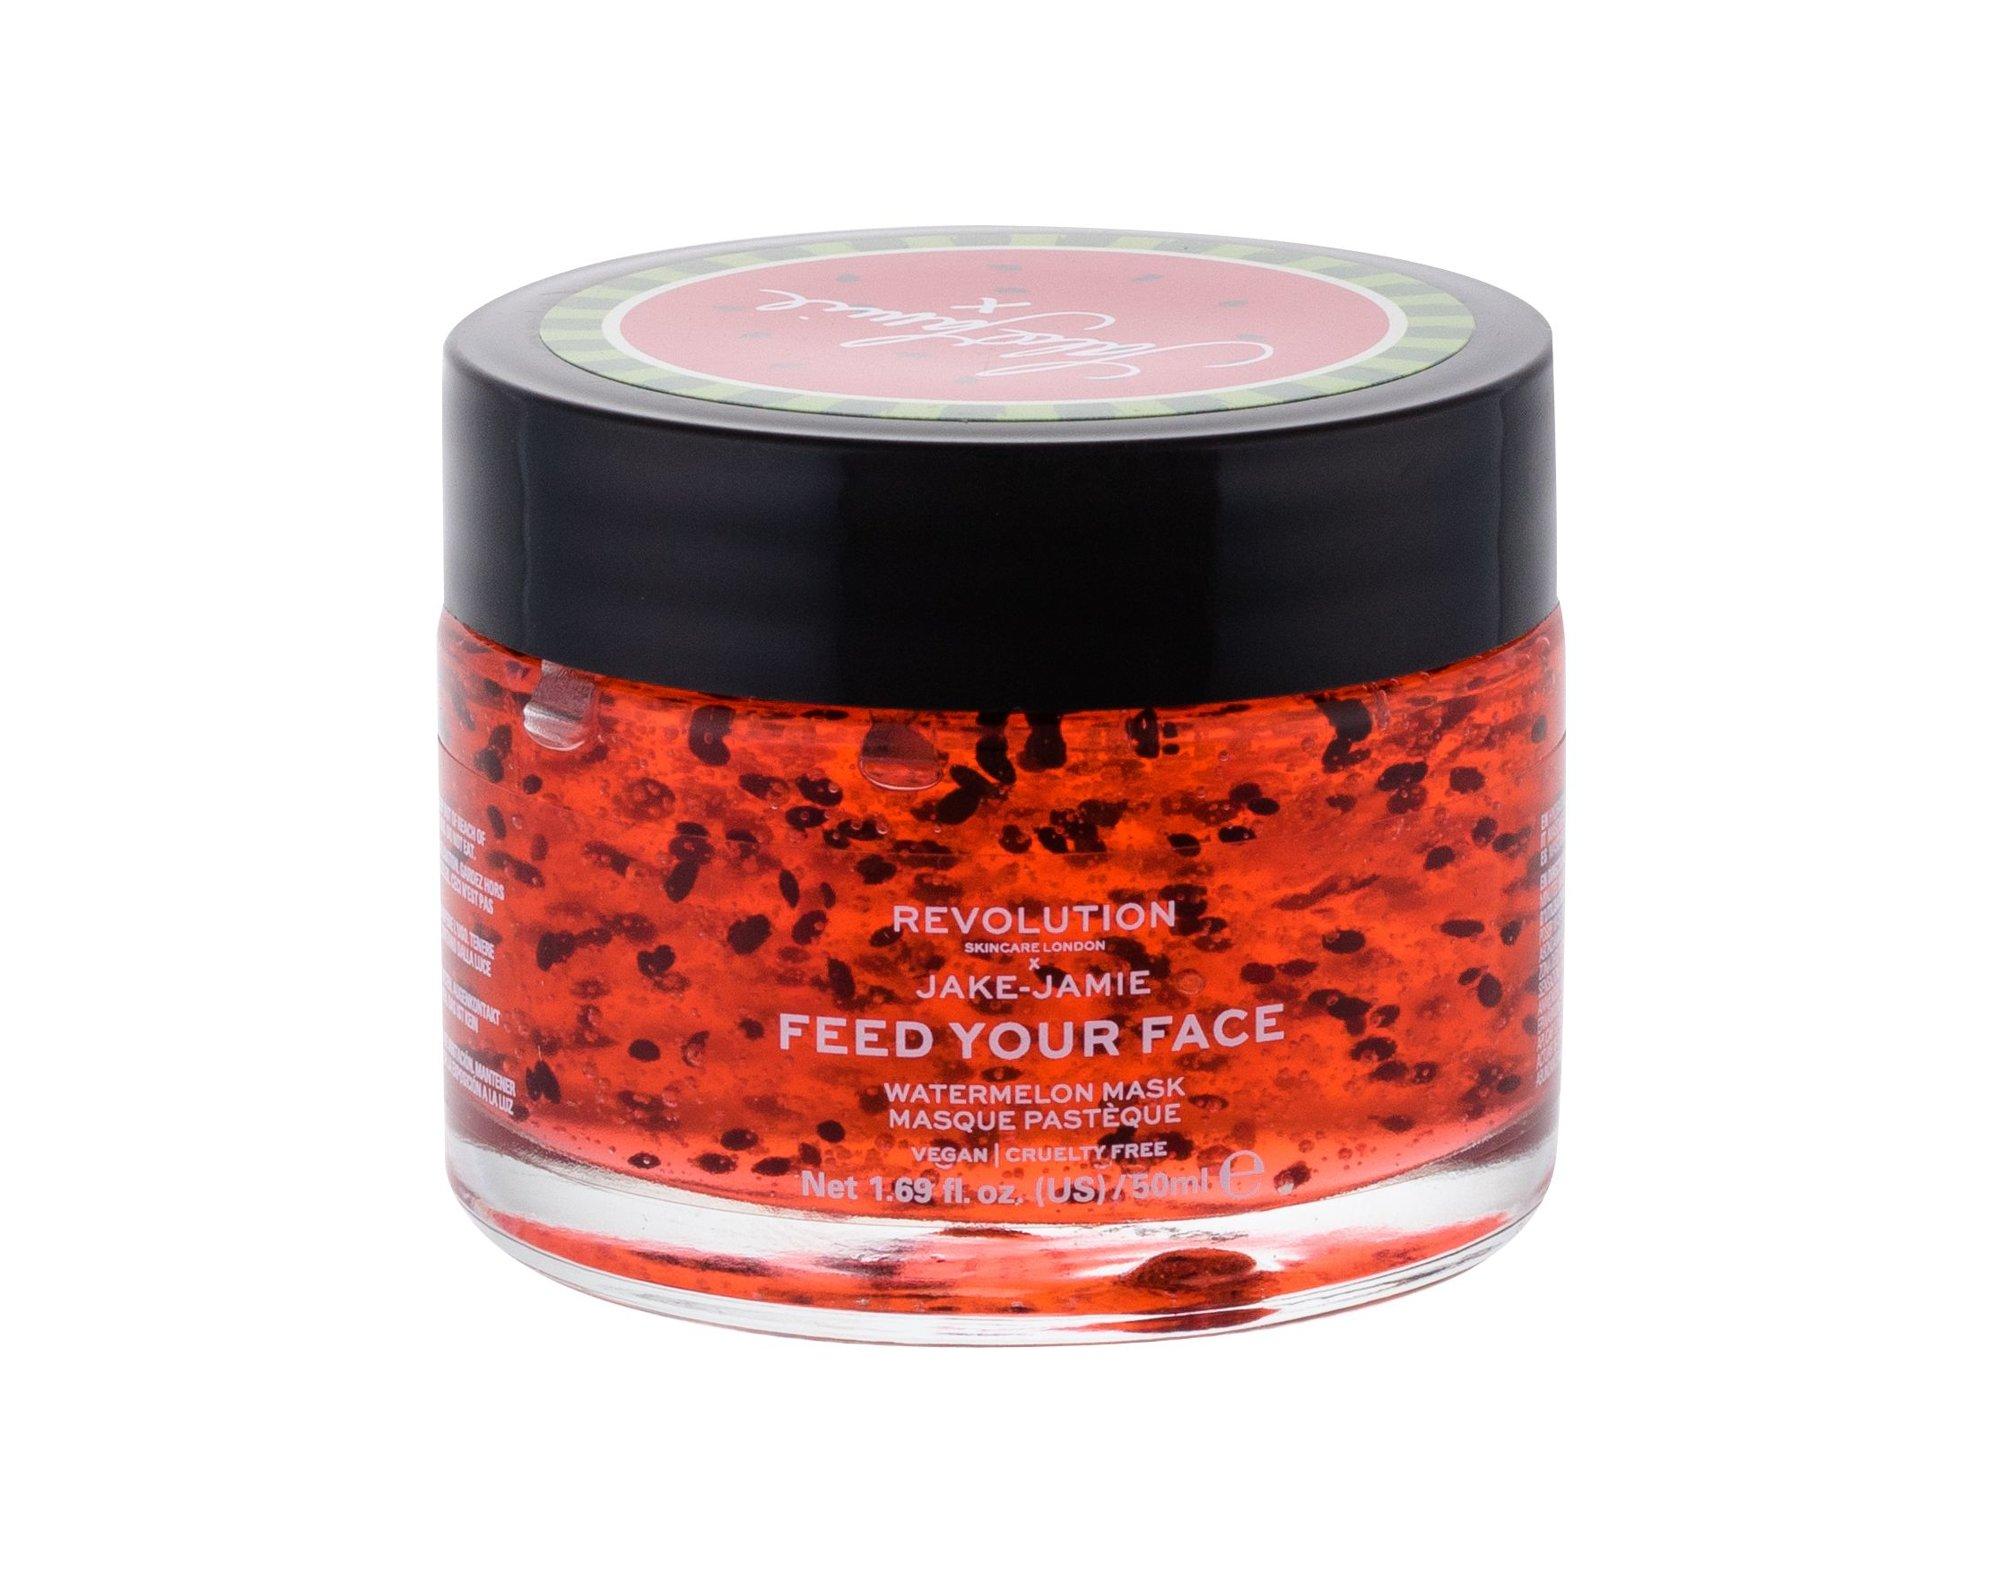 Makeup Revolution London Skincare X Jake-Jamie Face Mask 50ml Watermelon